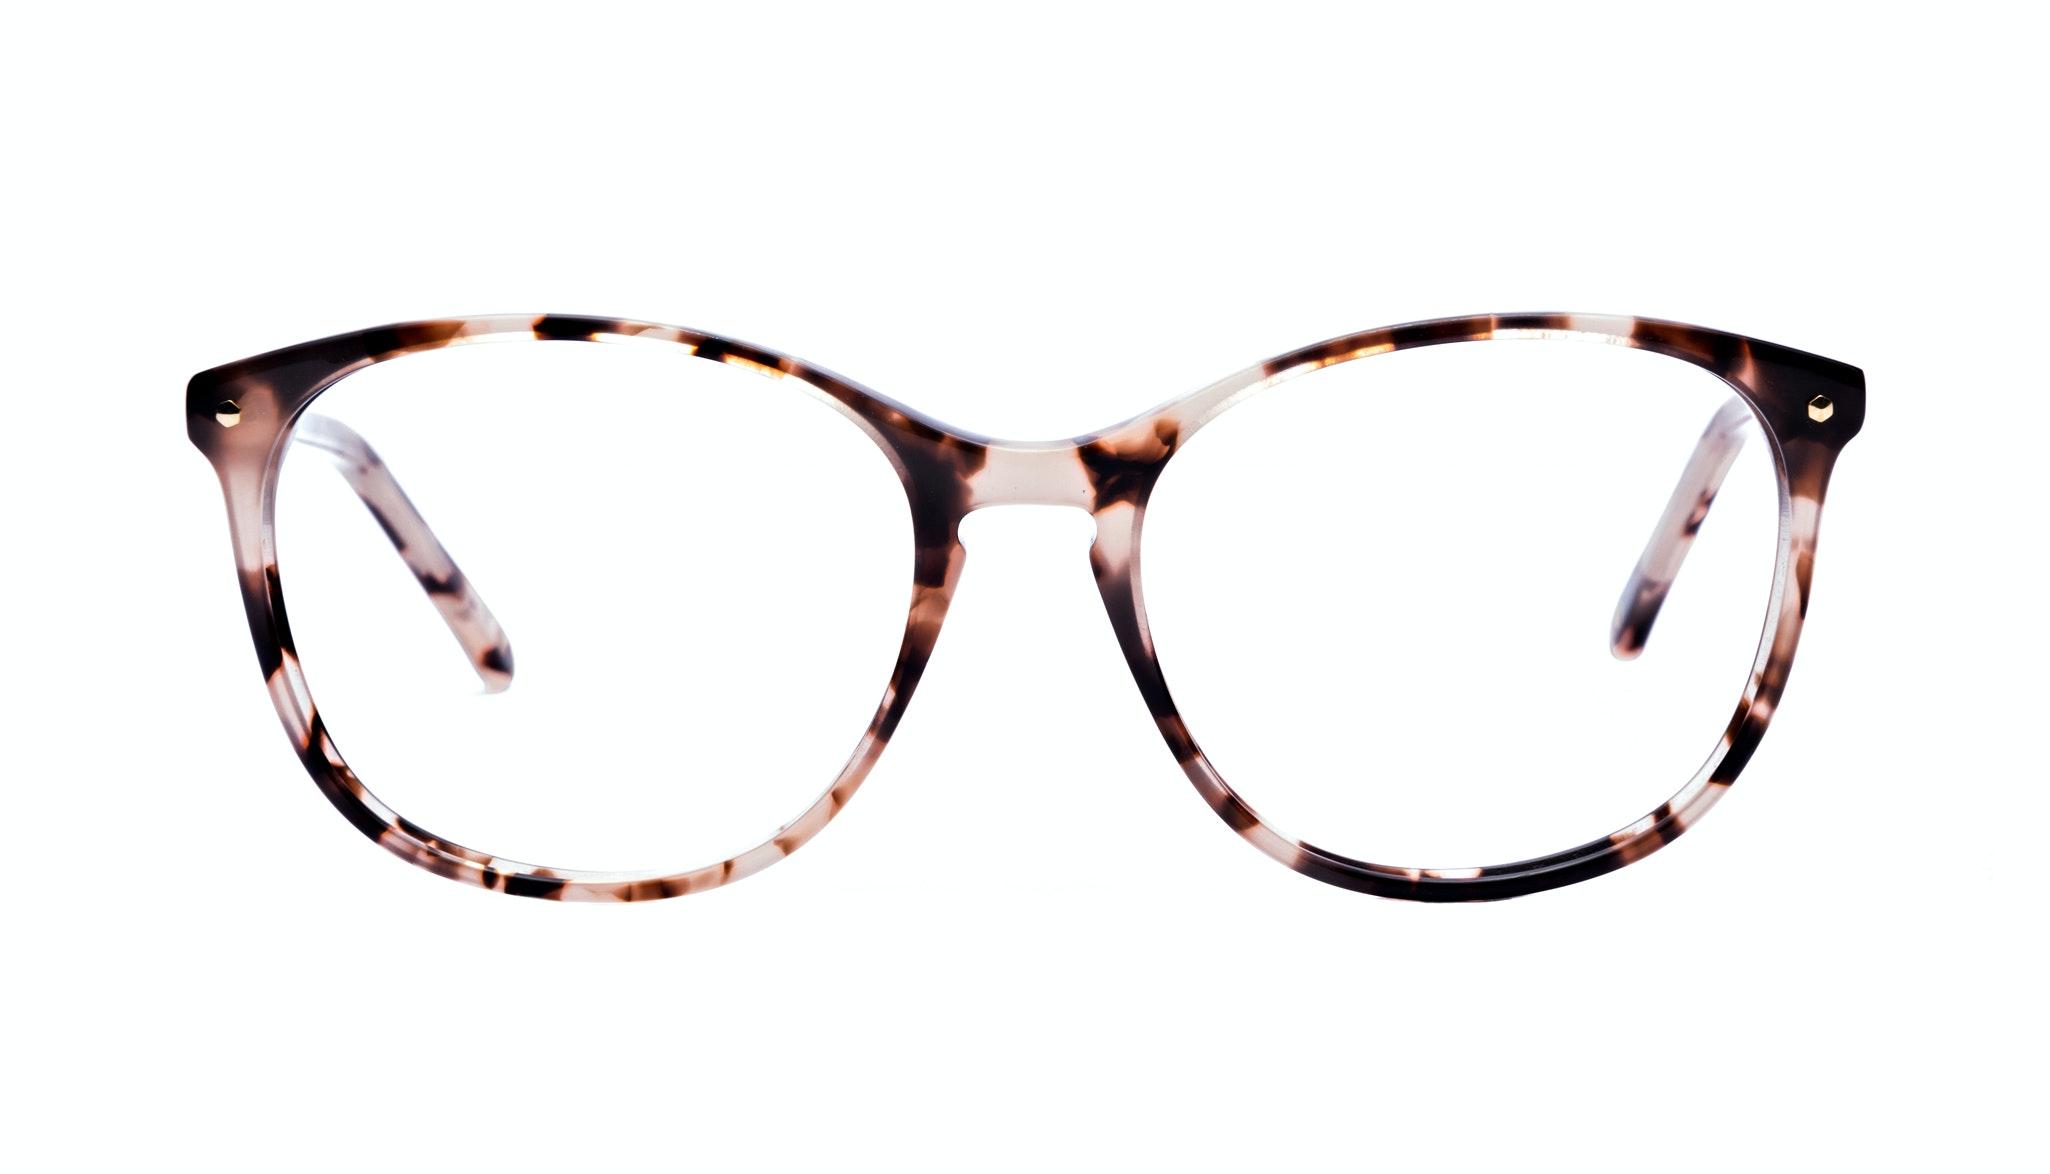 Affordable Fashion Glasses Rectangle Round Eyeglasses Women Nadine Pink Tortoise Front